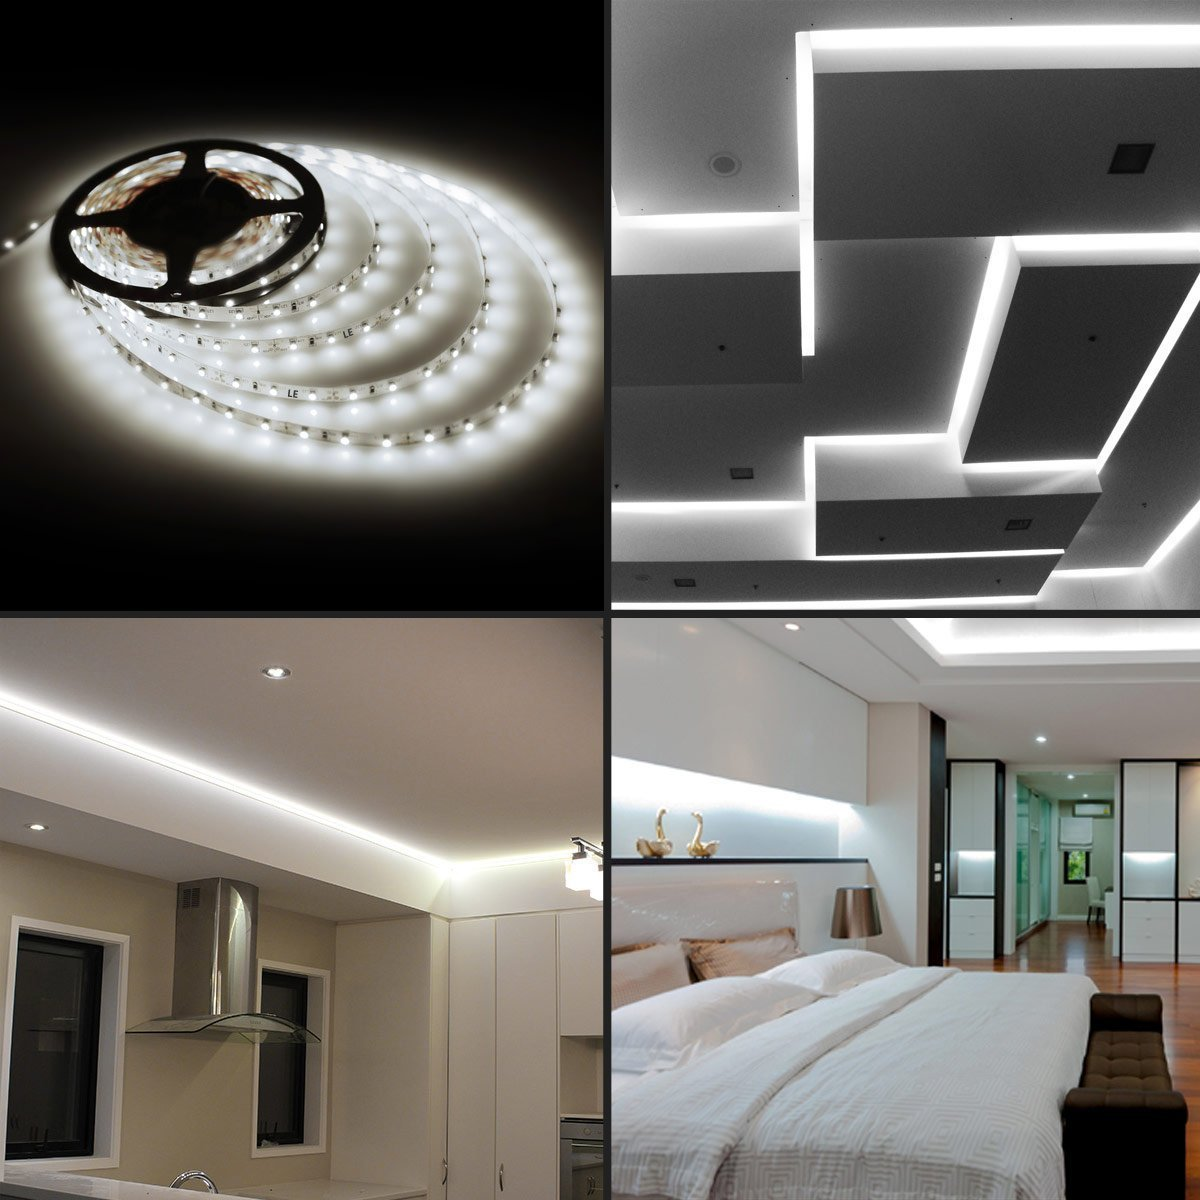 Do you already have led lighting inside the house part 1 come - Amazon Com Le 16 4ft 12v Flexible Led Light Strip Led Tape 6000k Daylight White 300 Units Smd 2835 Leds Non Waterproof Led Ribbon Led Light Strips